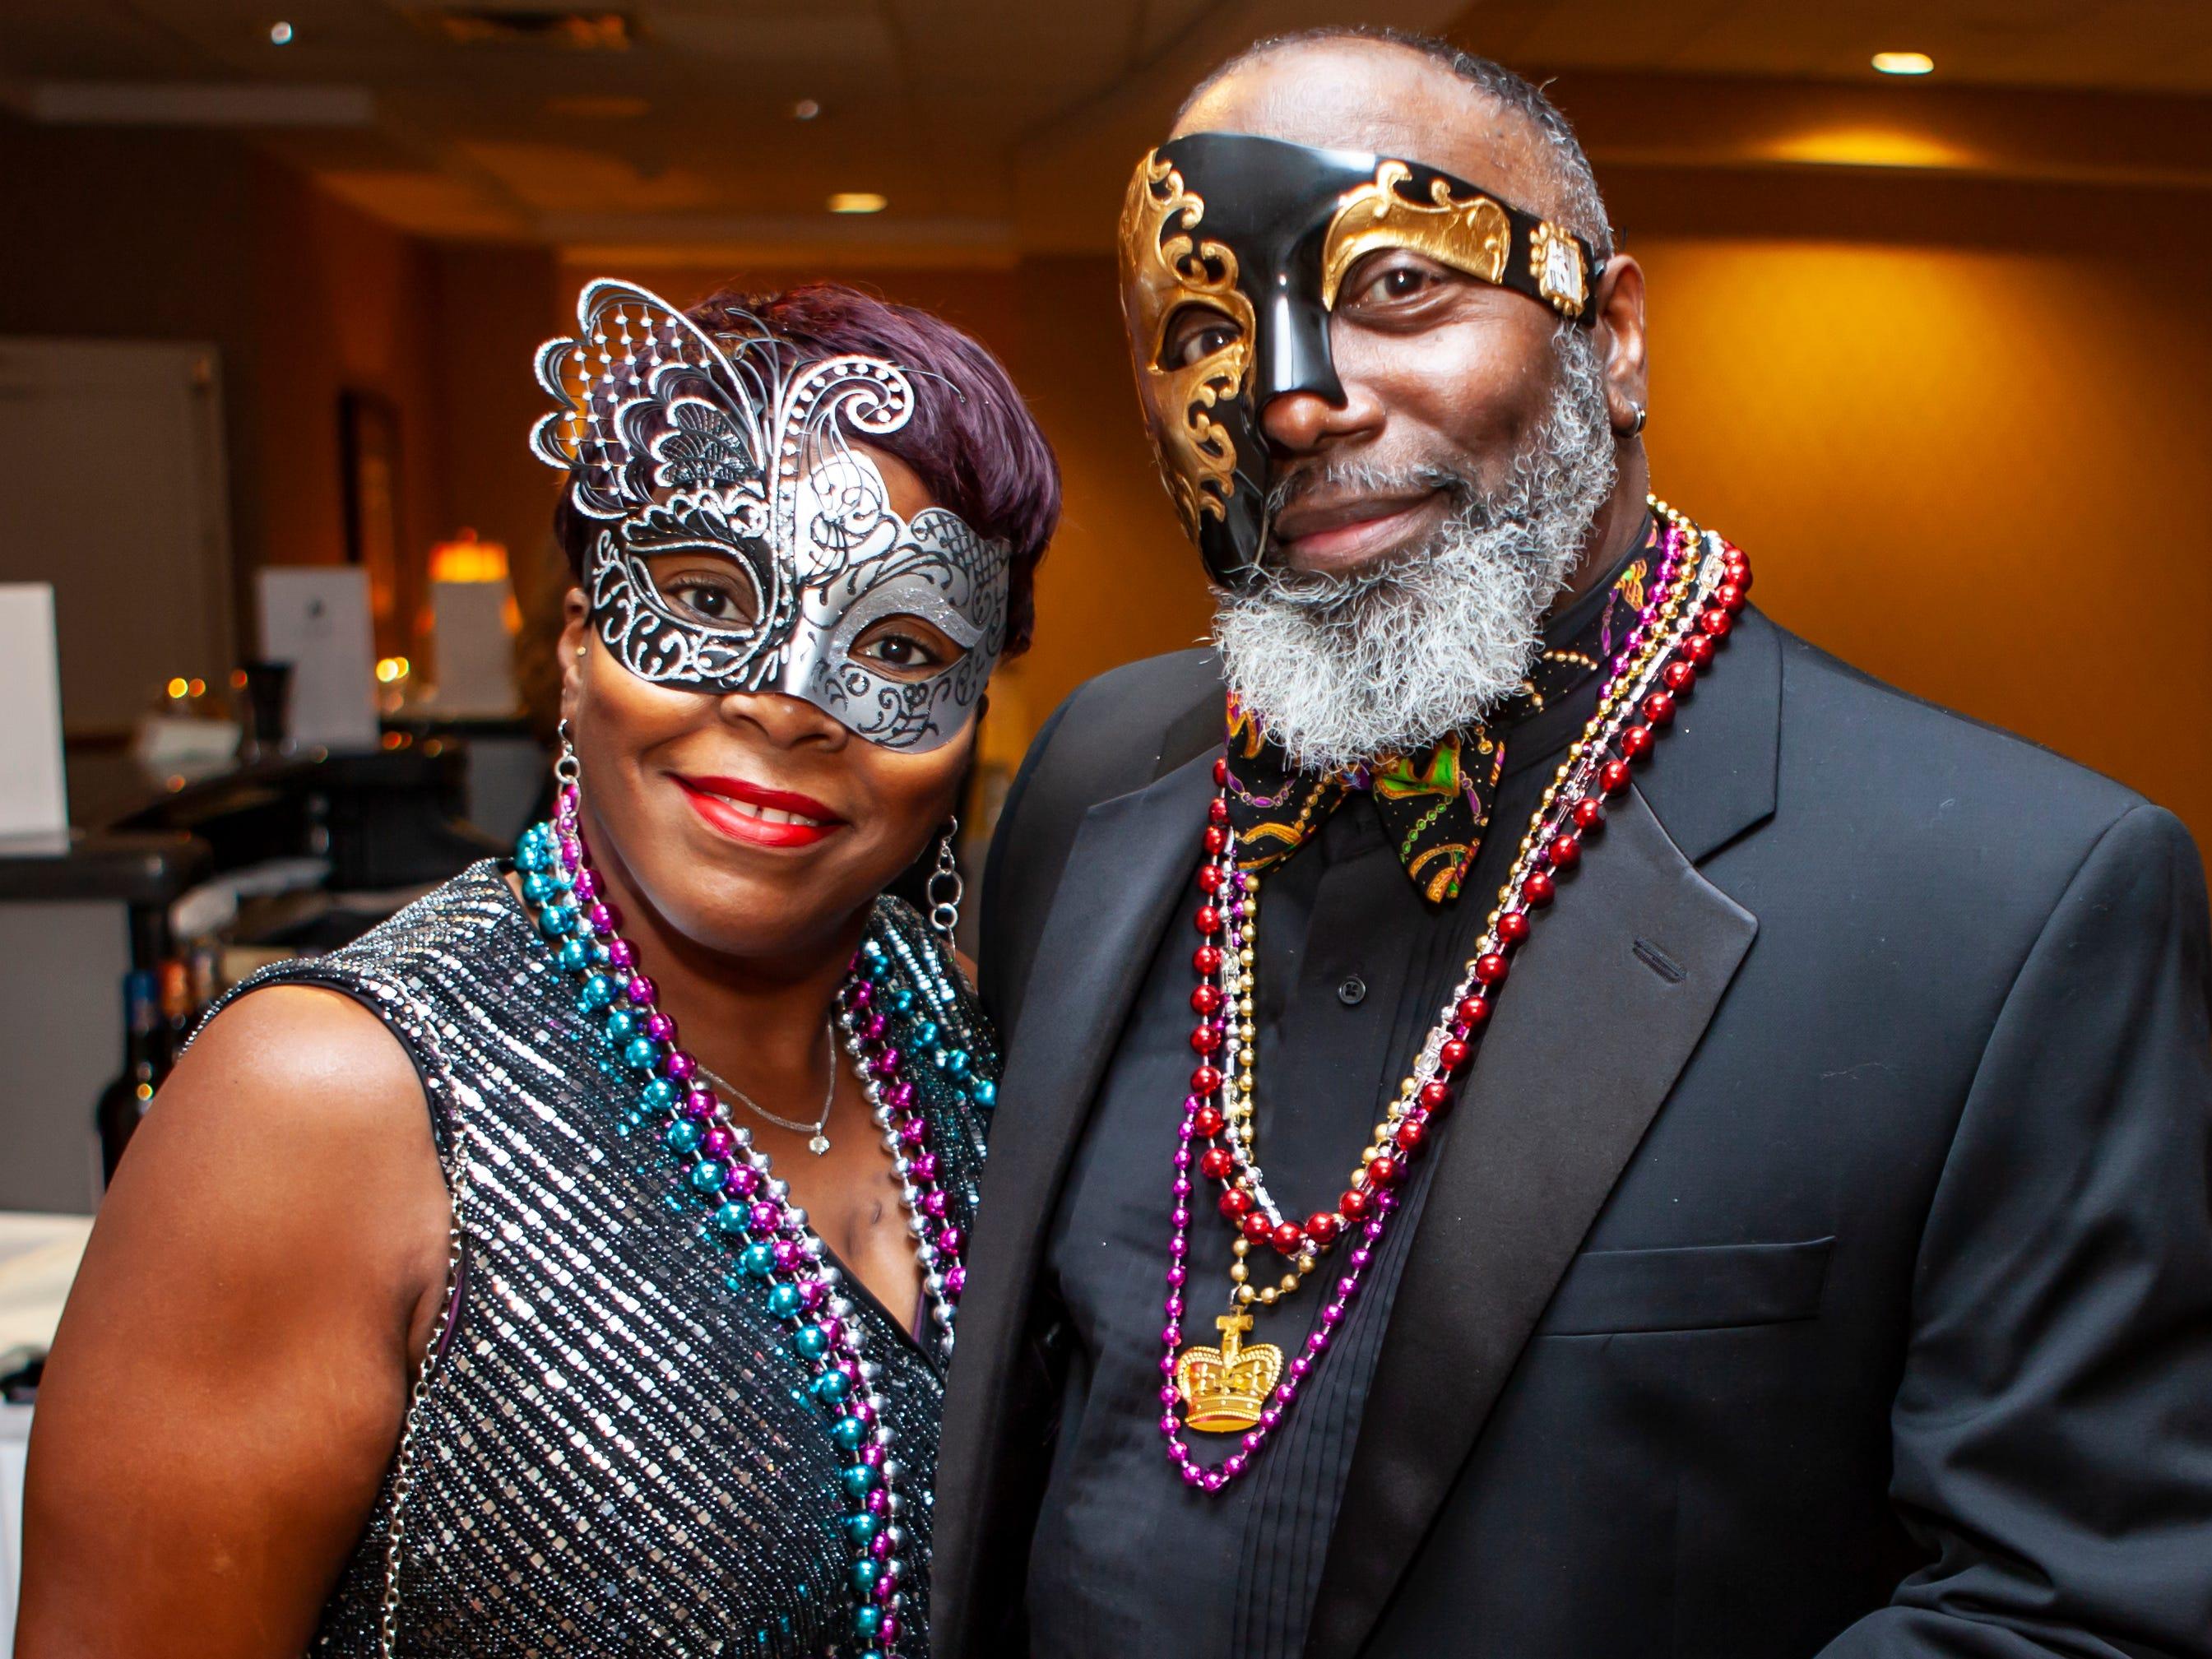 Darlene and Michael Johnson at the Omega Psi Phi Mardi Gras party held Saturday, Feb. 9, 2018 at Stones River Country Club in Murfreesboro.